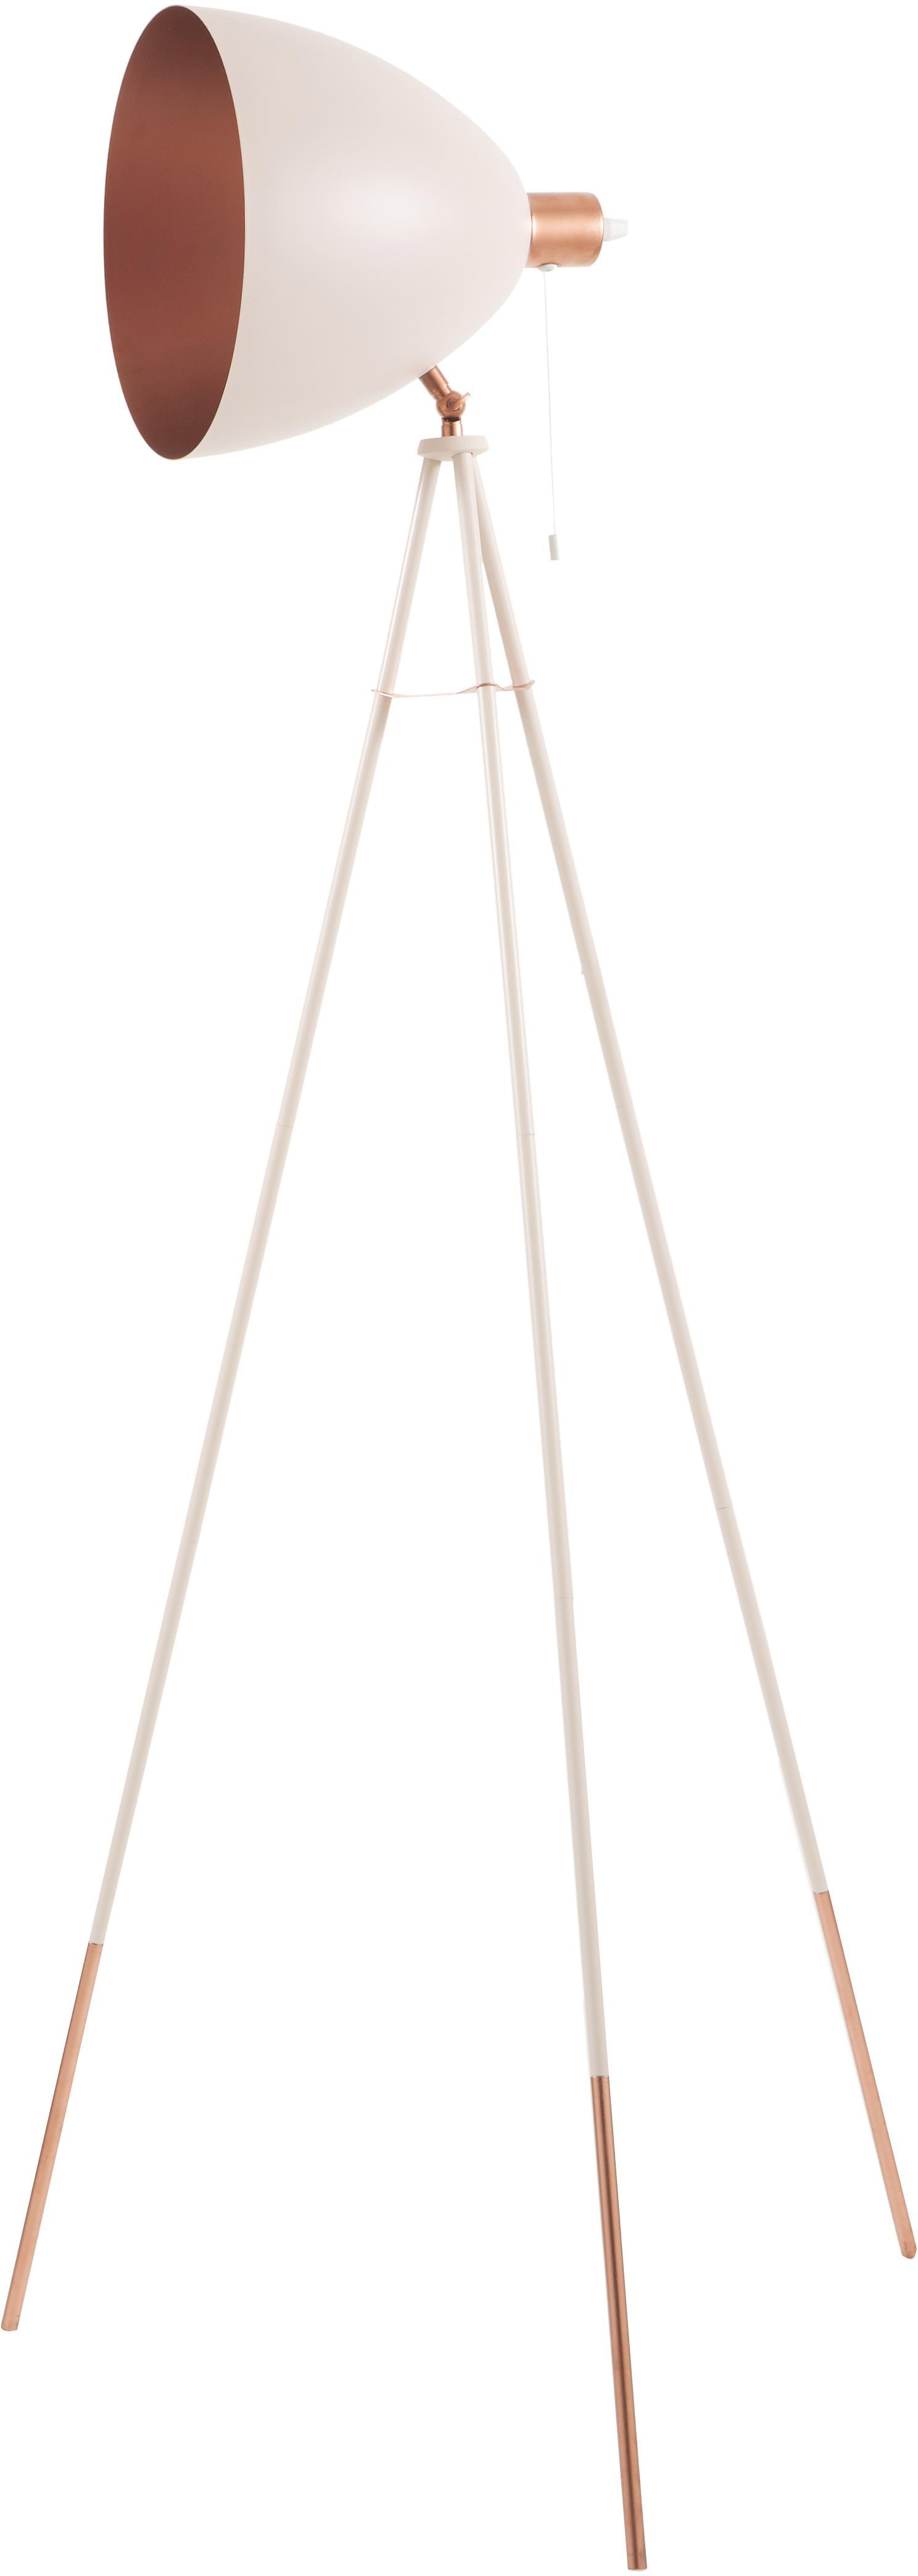 Lámpara de pie tripode Chester, Cable: plástico, Rosa, Ø 60 x Al 135 cm